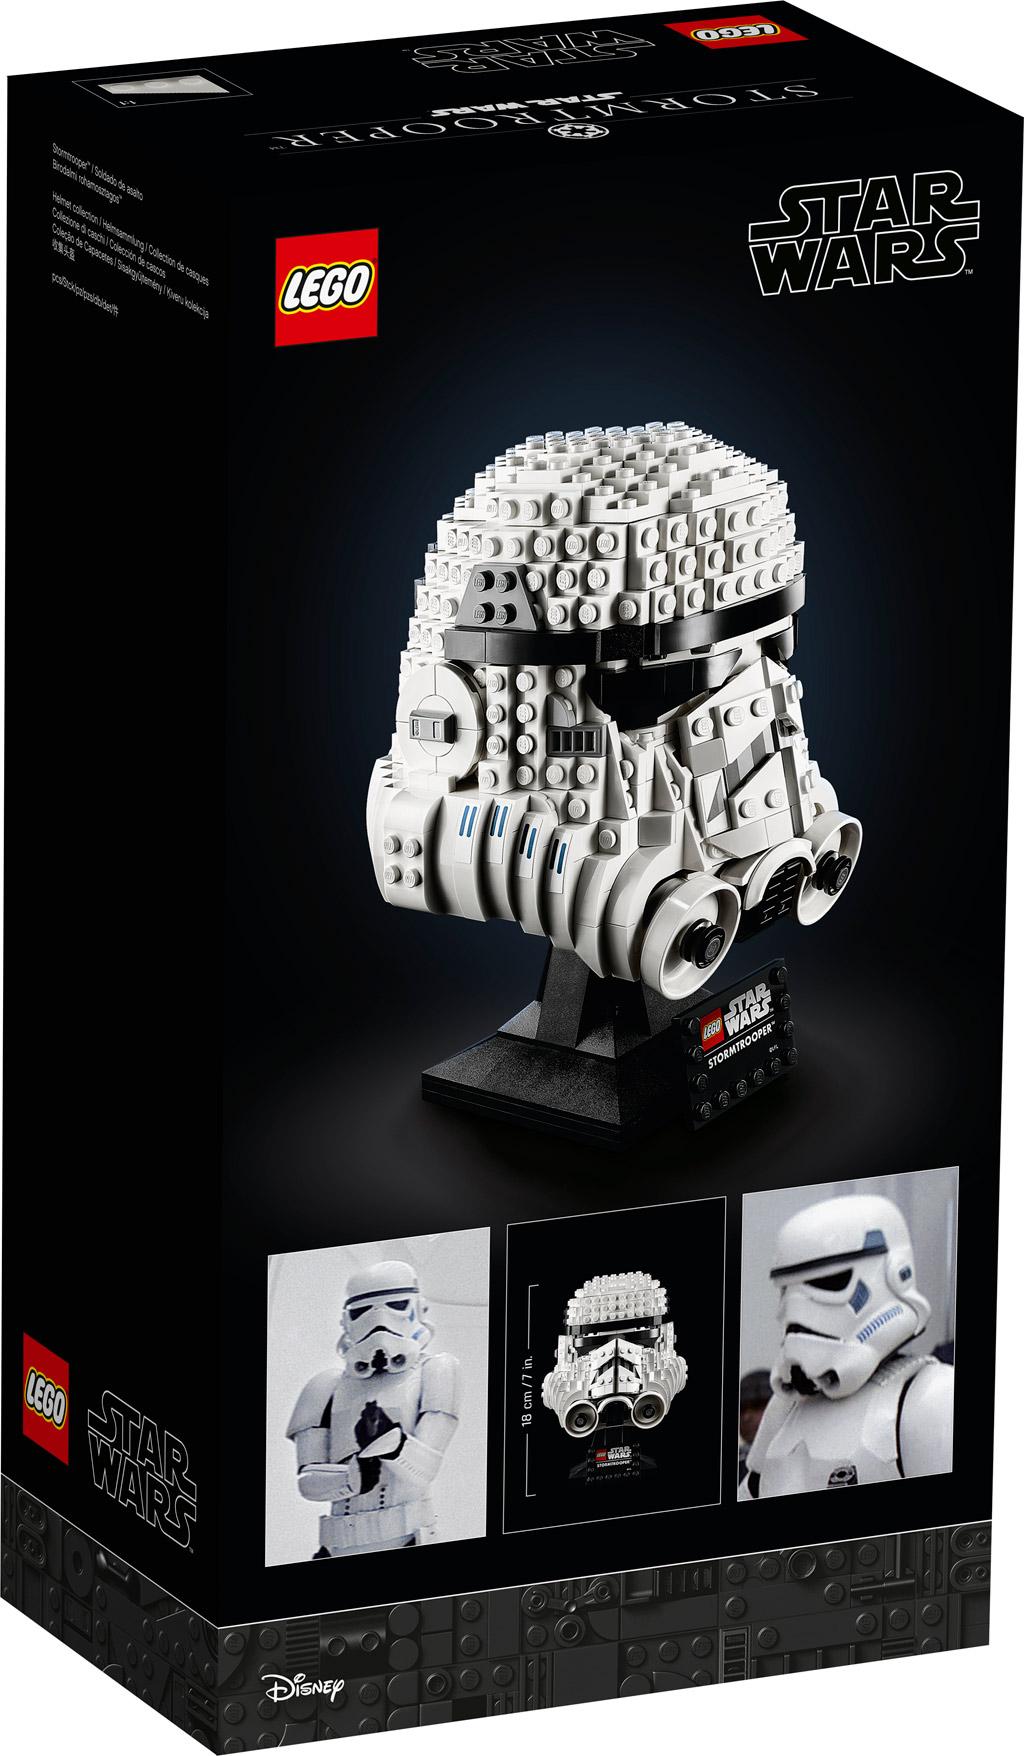 lego-star-wars-75276-stormtrooper-helm-box-back-2020 zusammengebaut.com